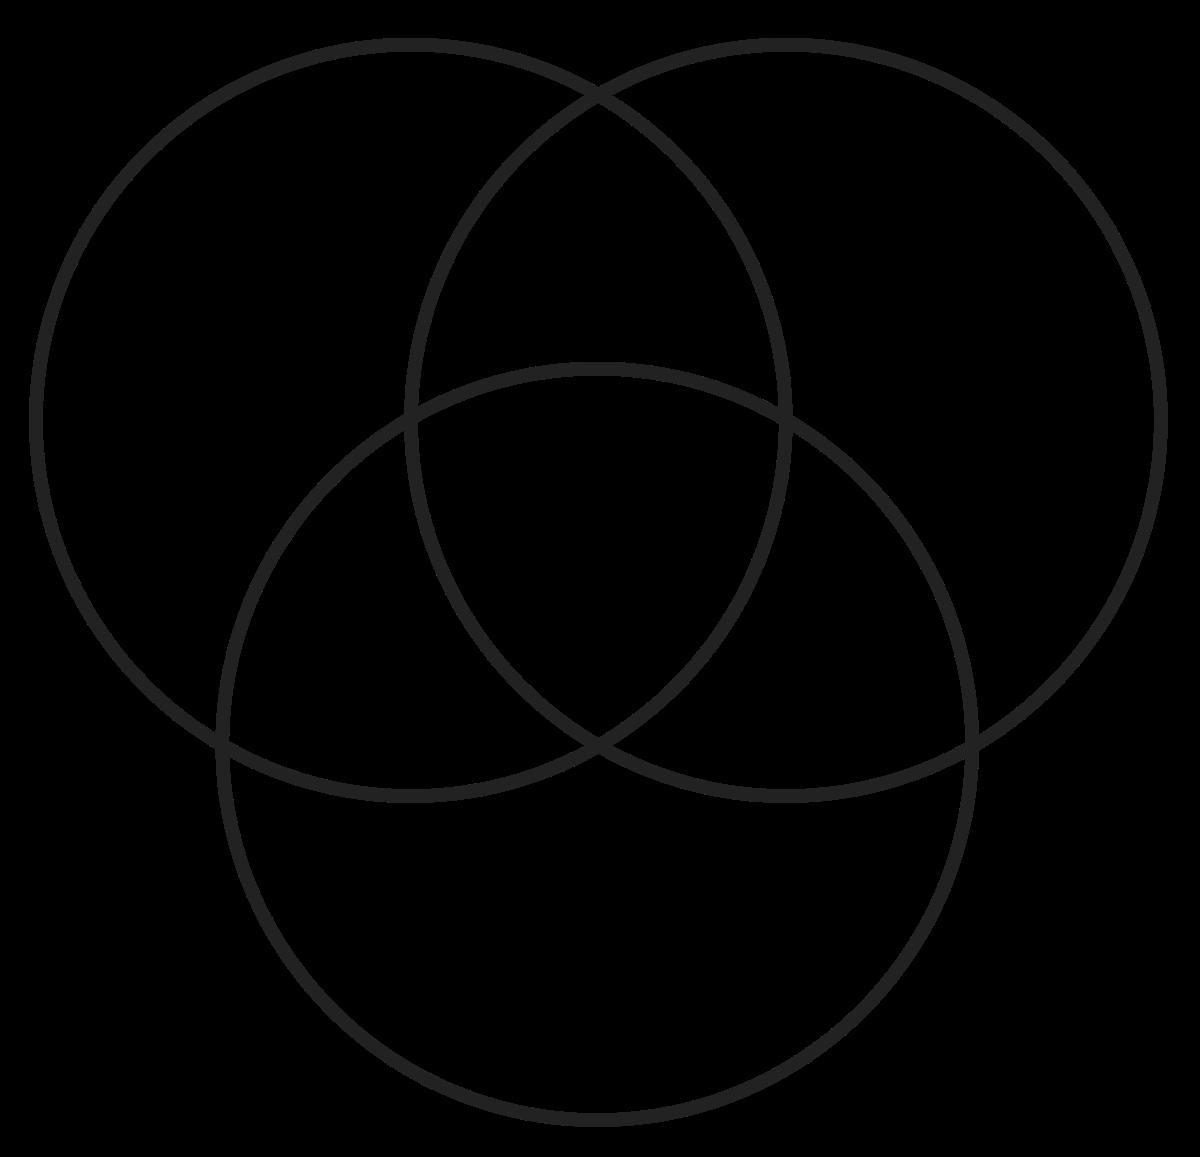 What Is A Venn Diagram Venn Diagram Wikipedia